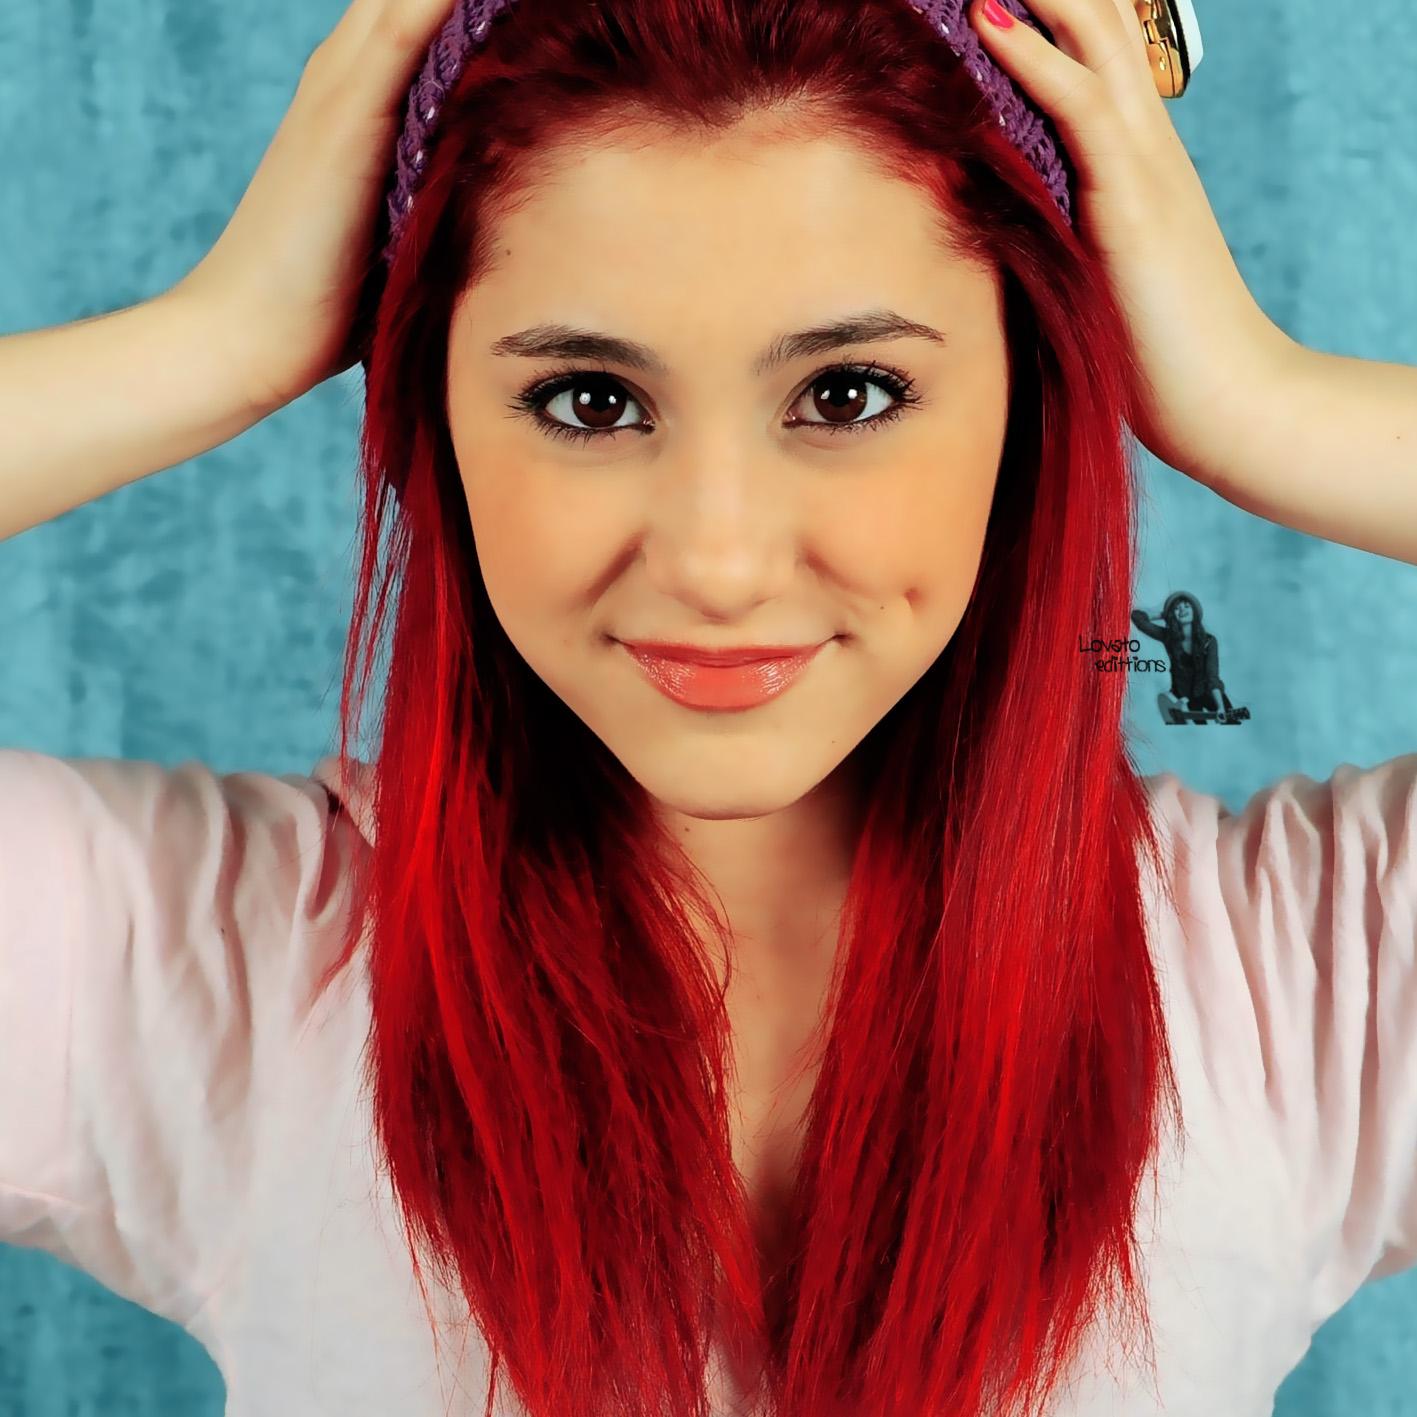 image ariana grande red hair jpg sam and cat wiki fandom